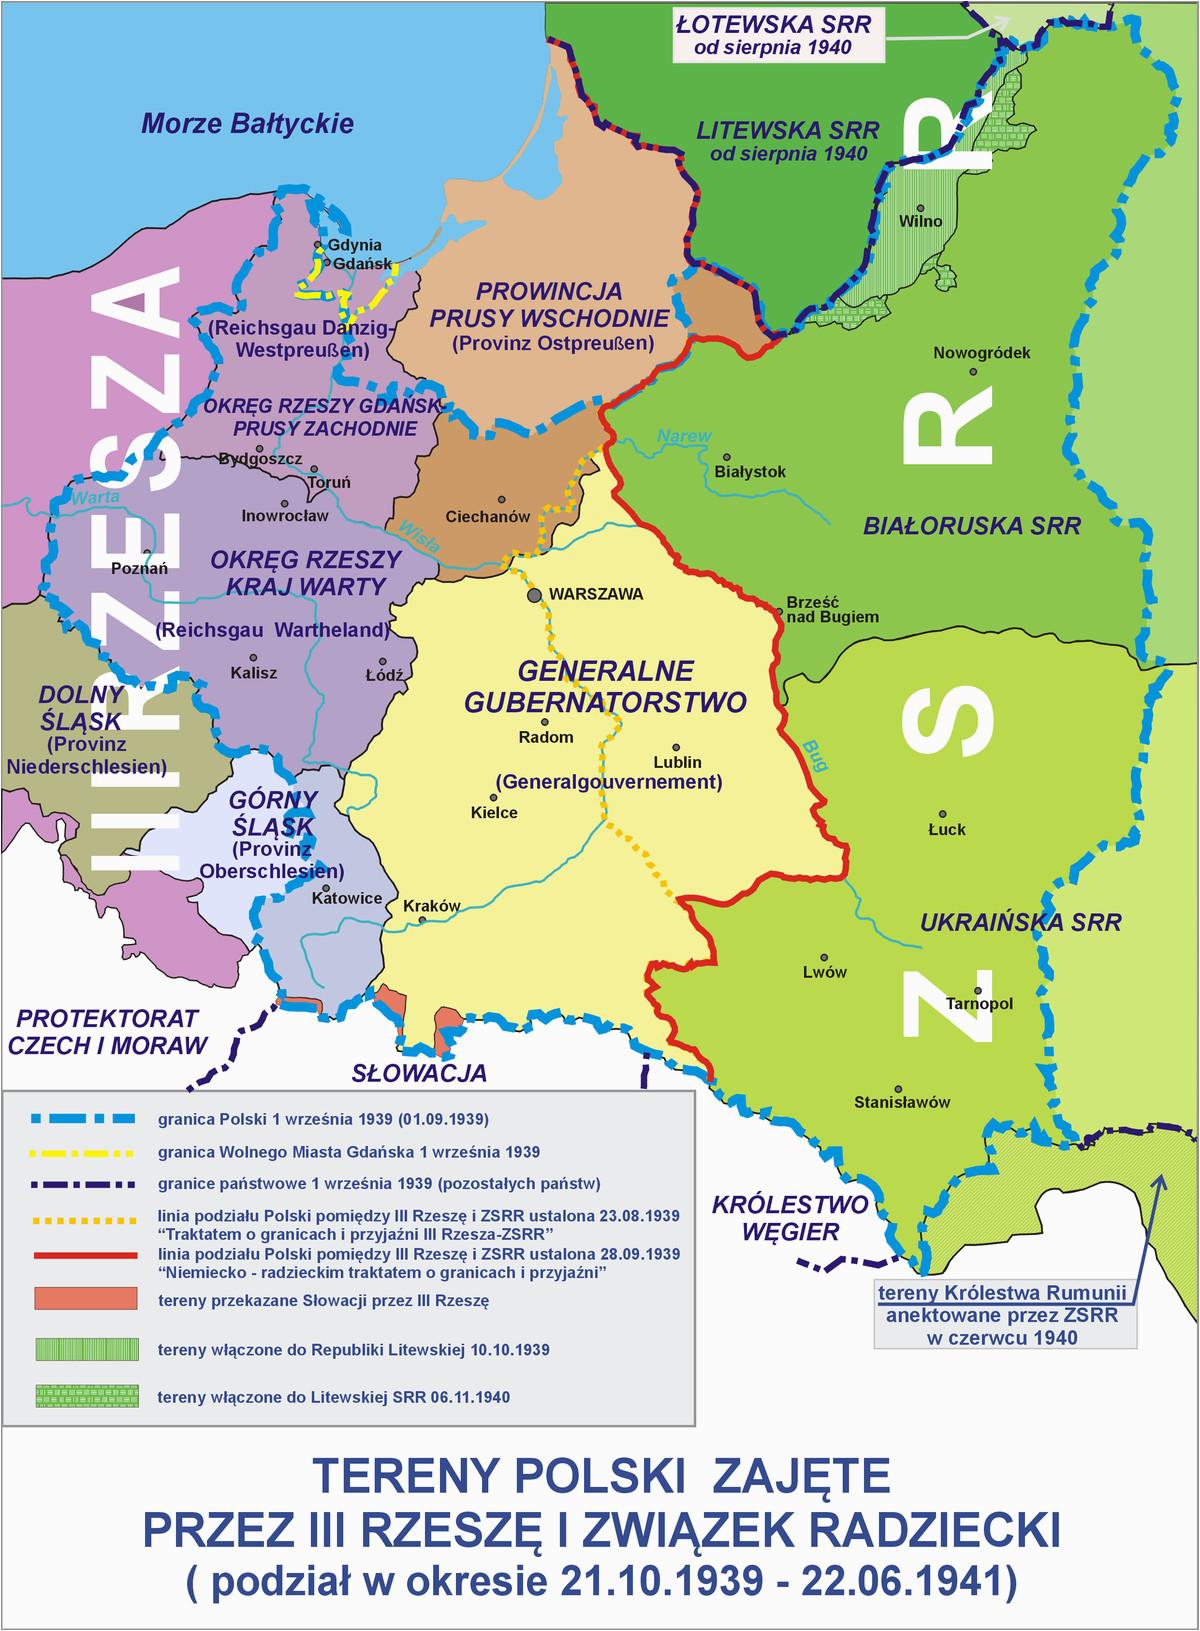 polish areas annexed by nazi germany wikipedia